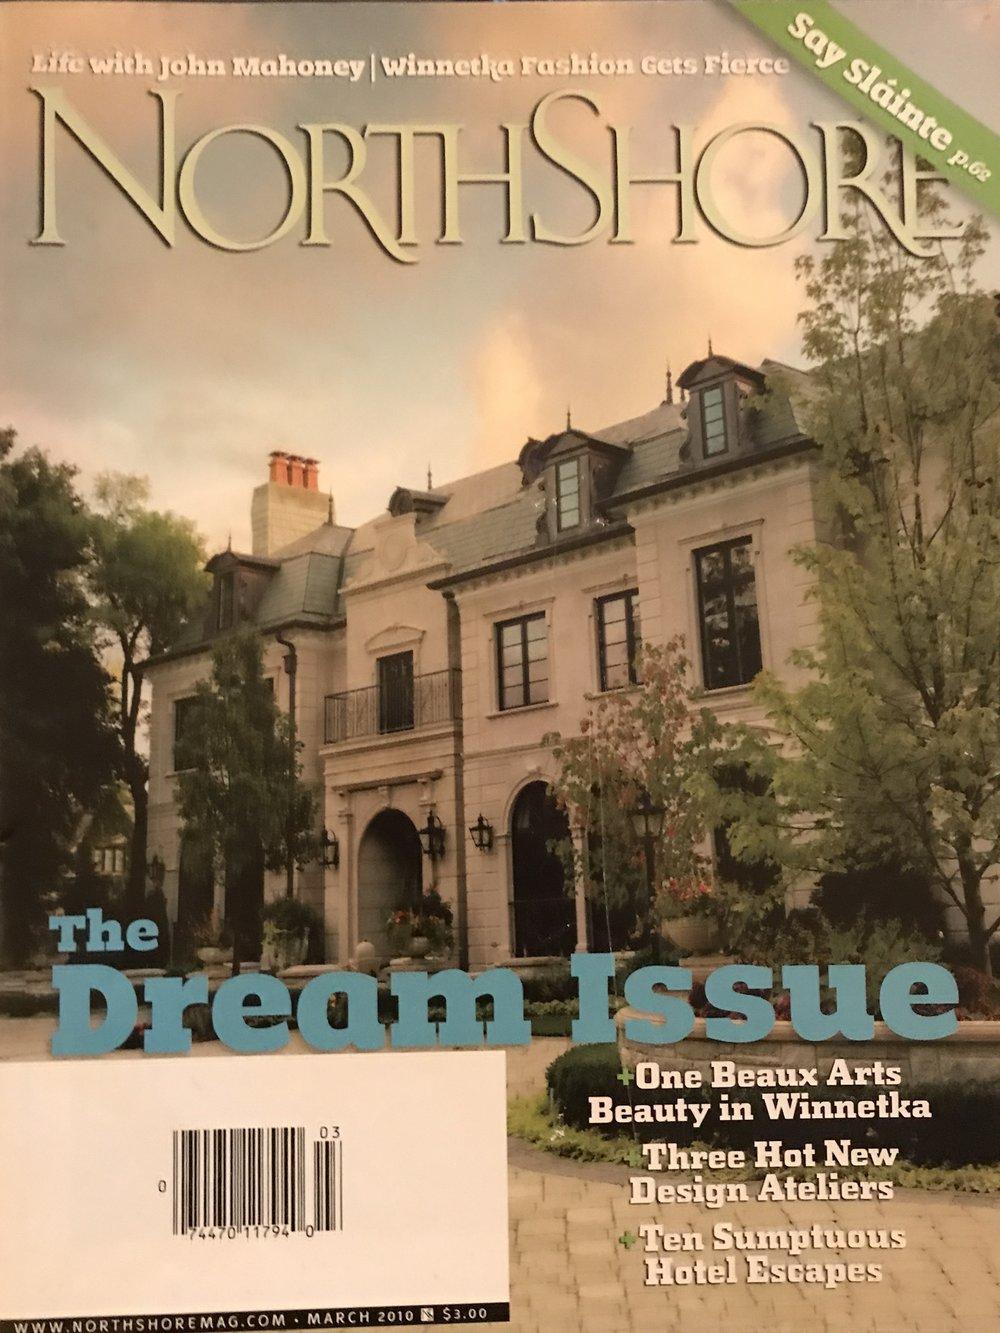 Northshore Magazine cover SGE home.jpg